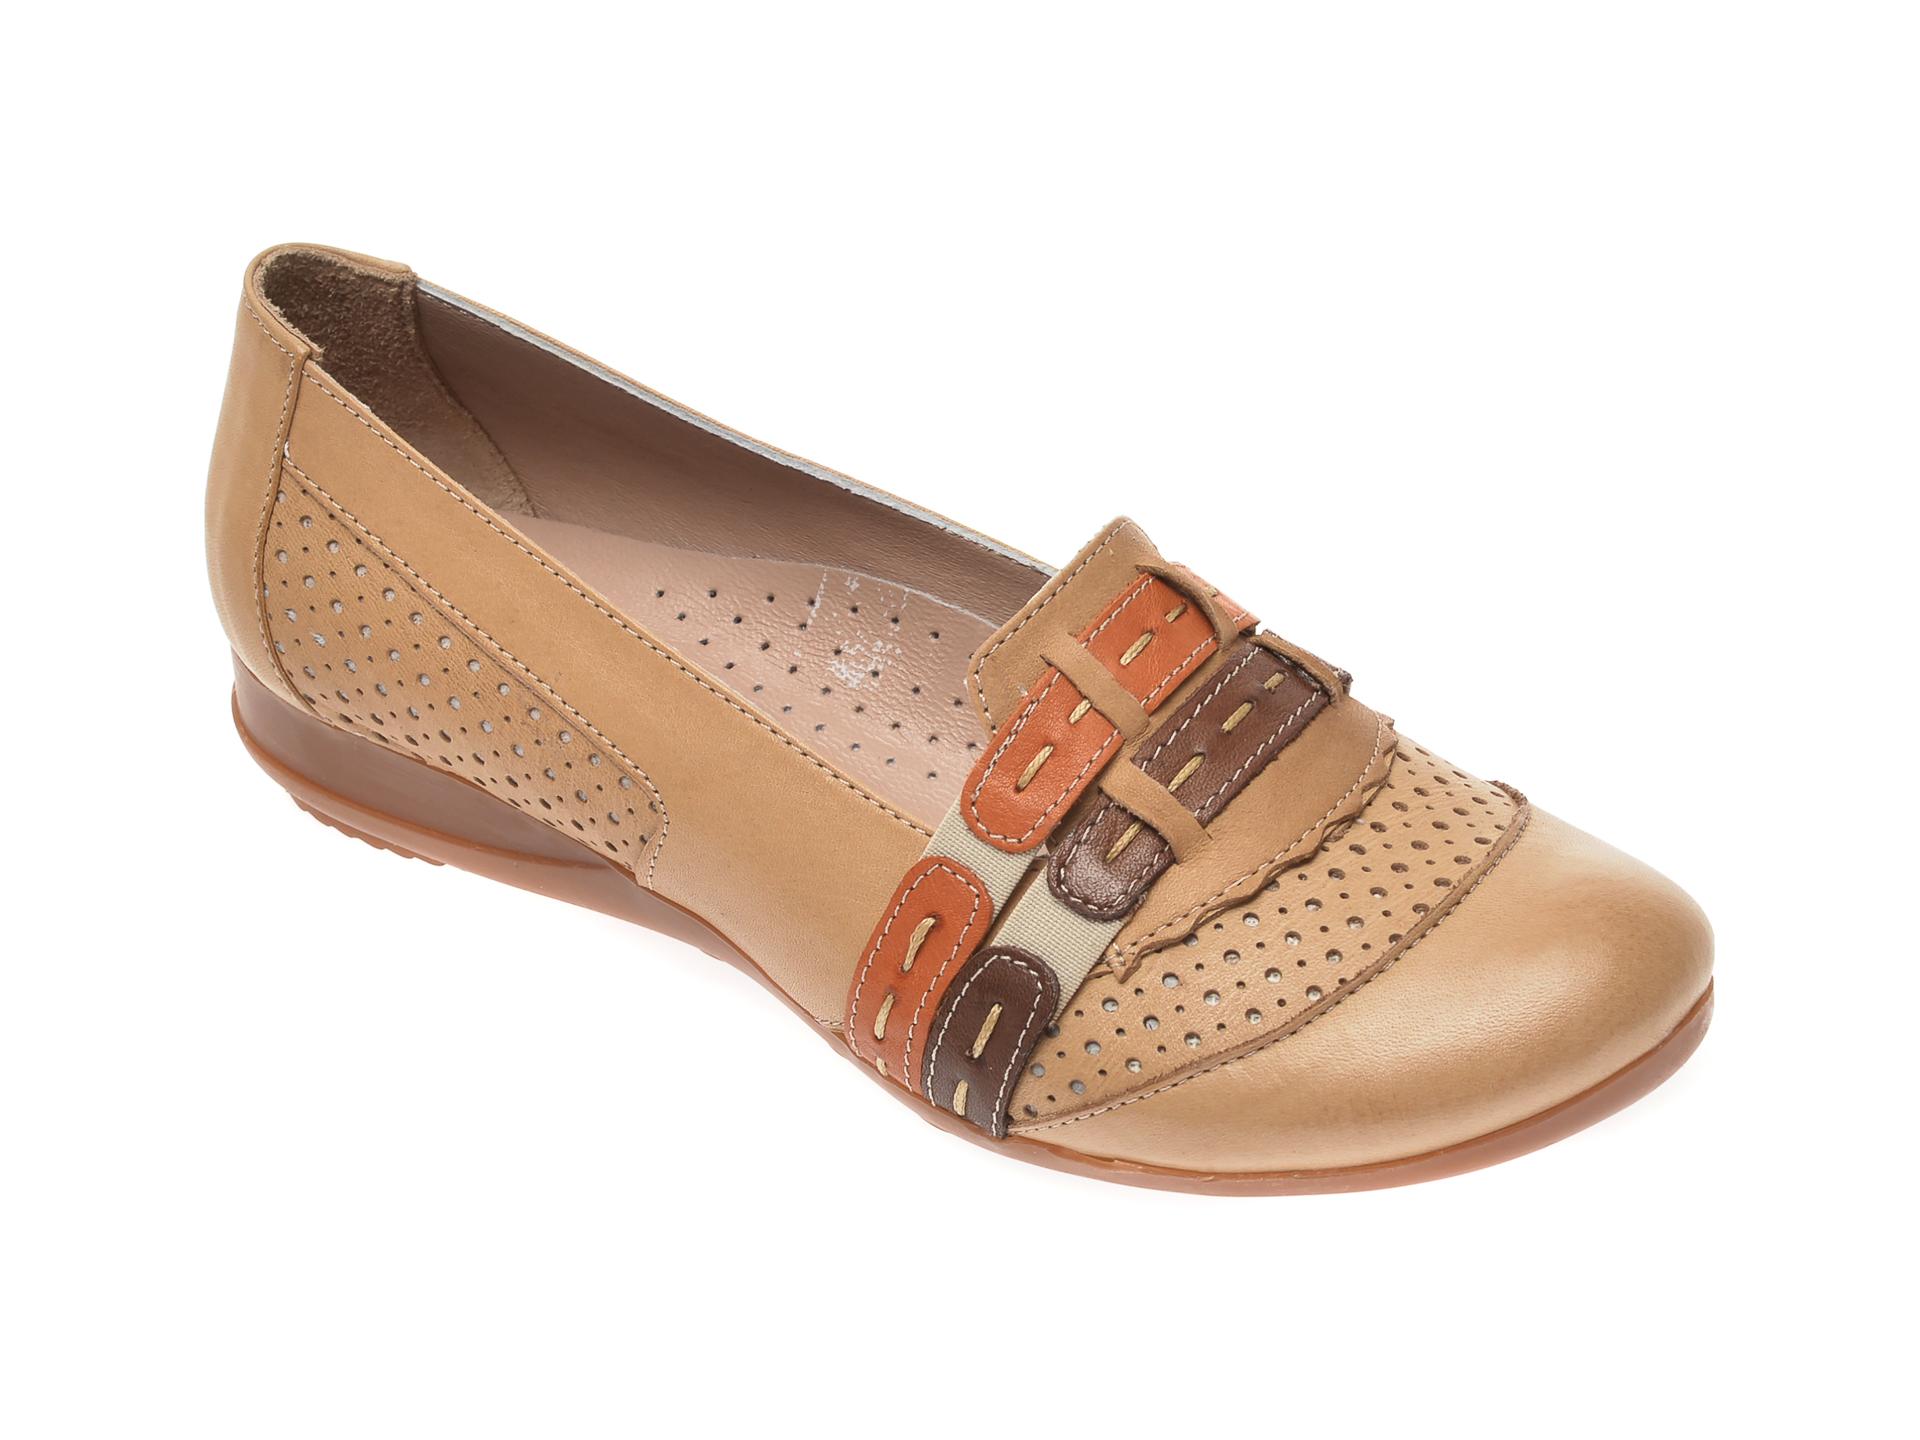 Pantofi FLAVIA PASSINI bej B0304, din piele naturala